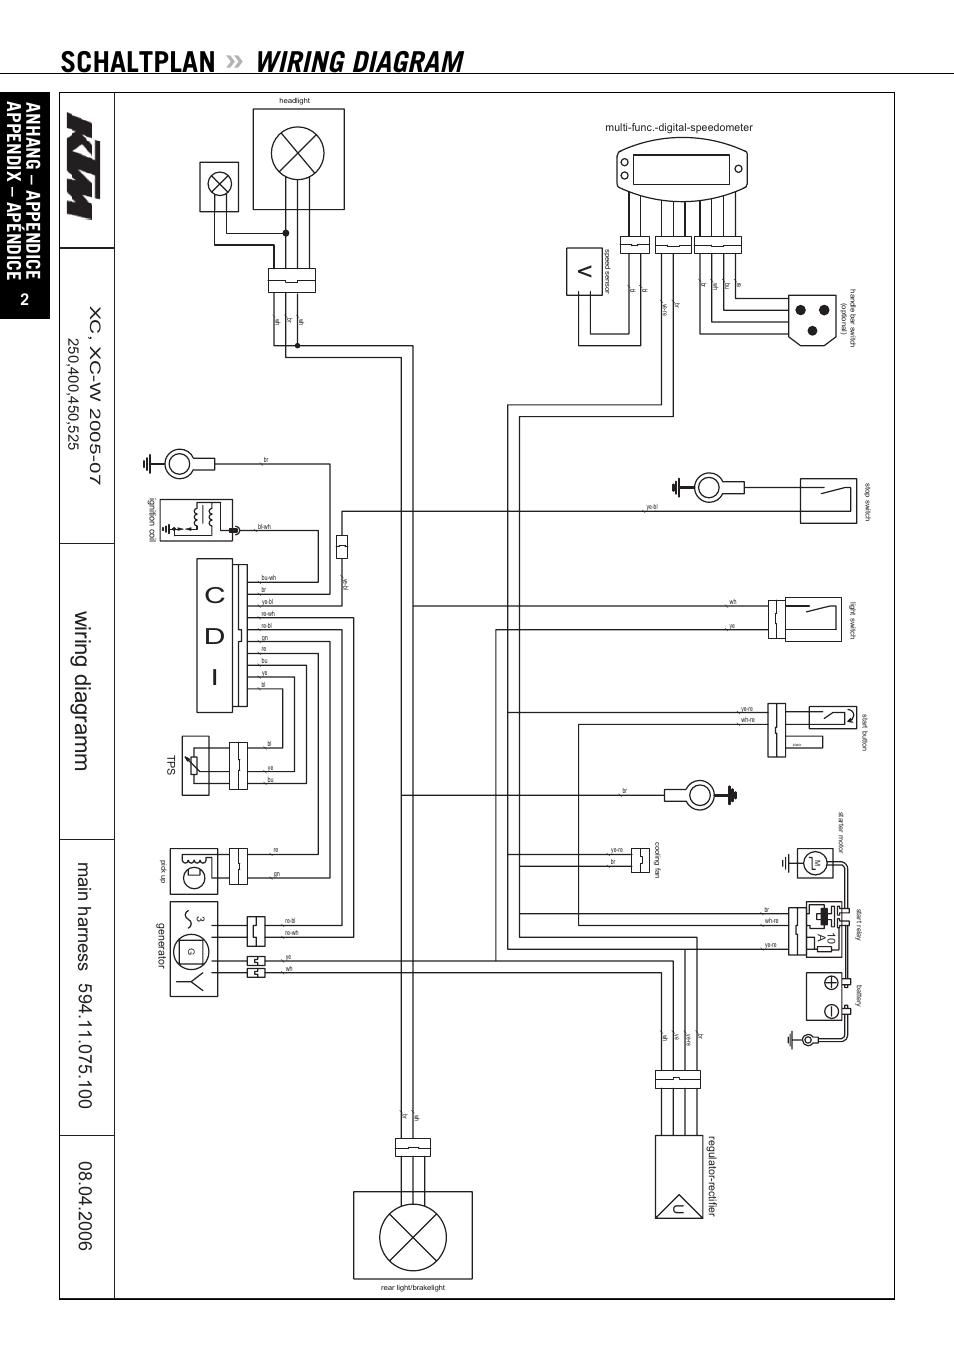 wiring diagram 06 ktm 450 sx wiring diagram database 2008 KTM Mini Adventure g 06 ktm exc wiring diagram basic electronics wiring diagram ktm 520 sx wiring diagram wiring